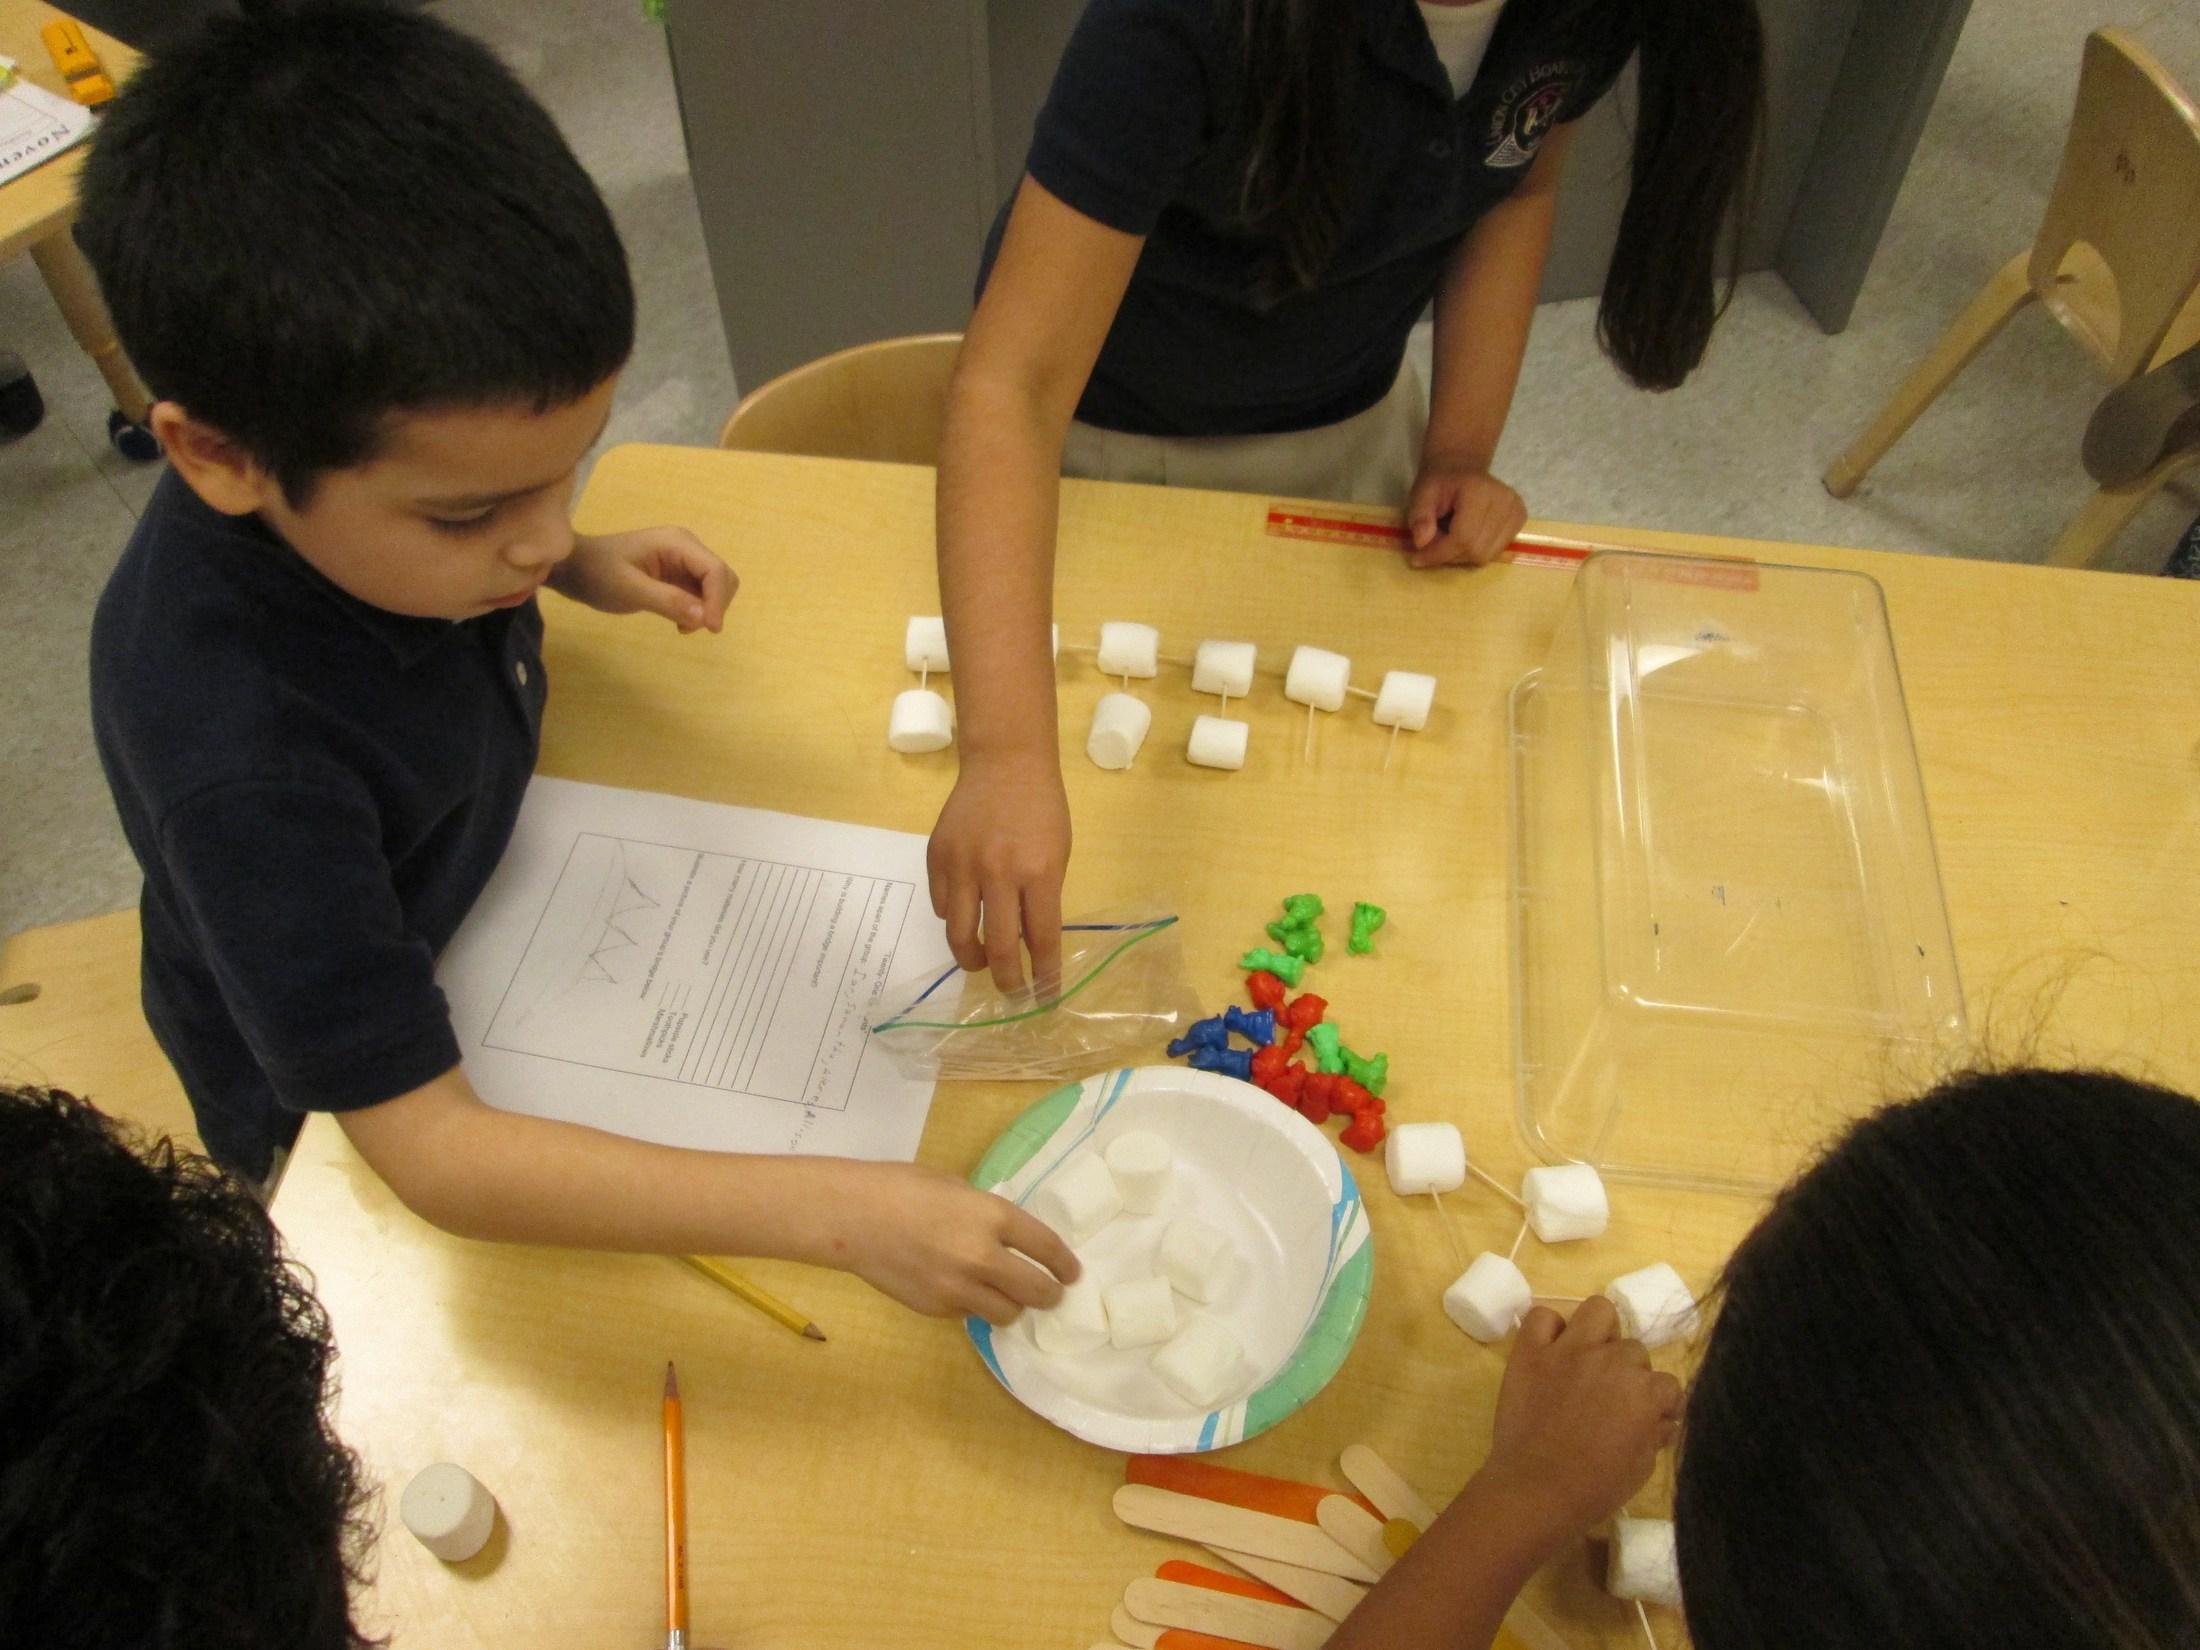 boy counting sugar cubes